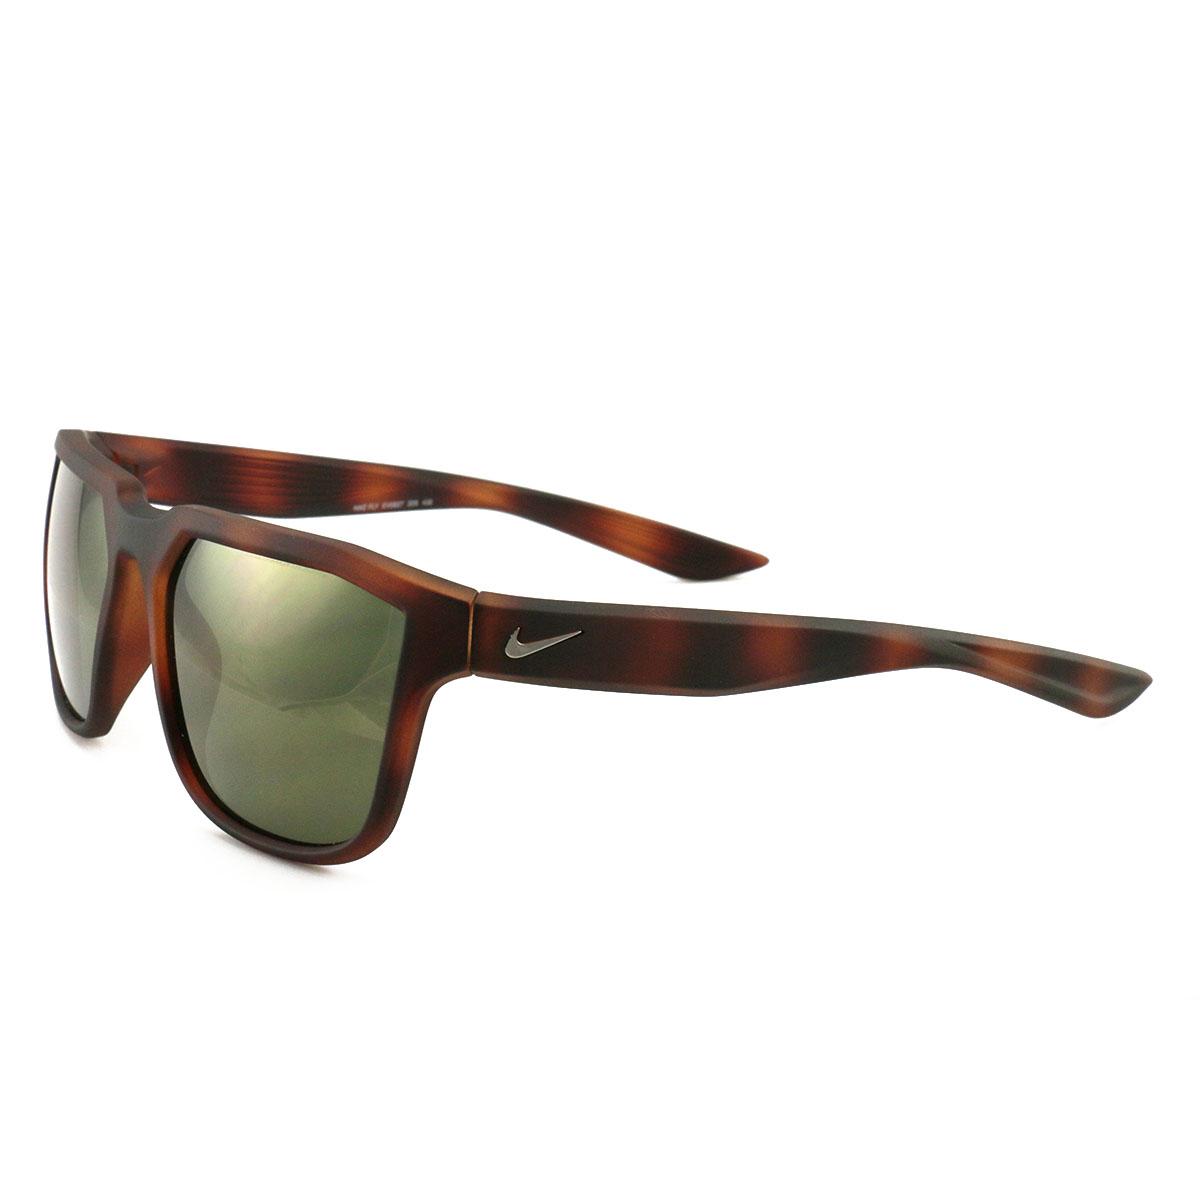 a0f6d62e9ac Nike Fly Sunglasses EV0927 205 Matte Tortoise Gren Gun 57 18 150